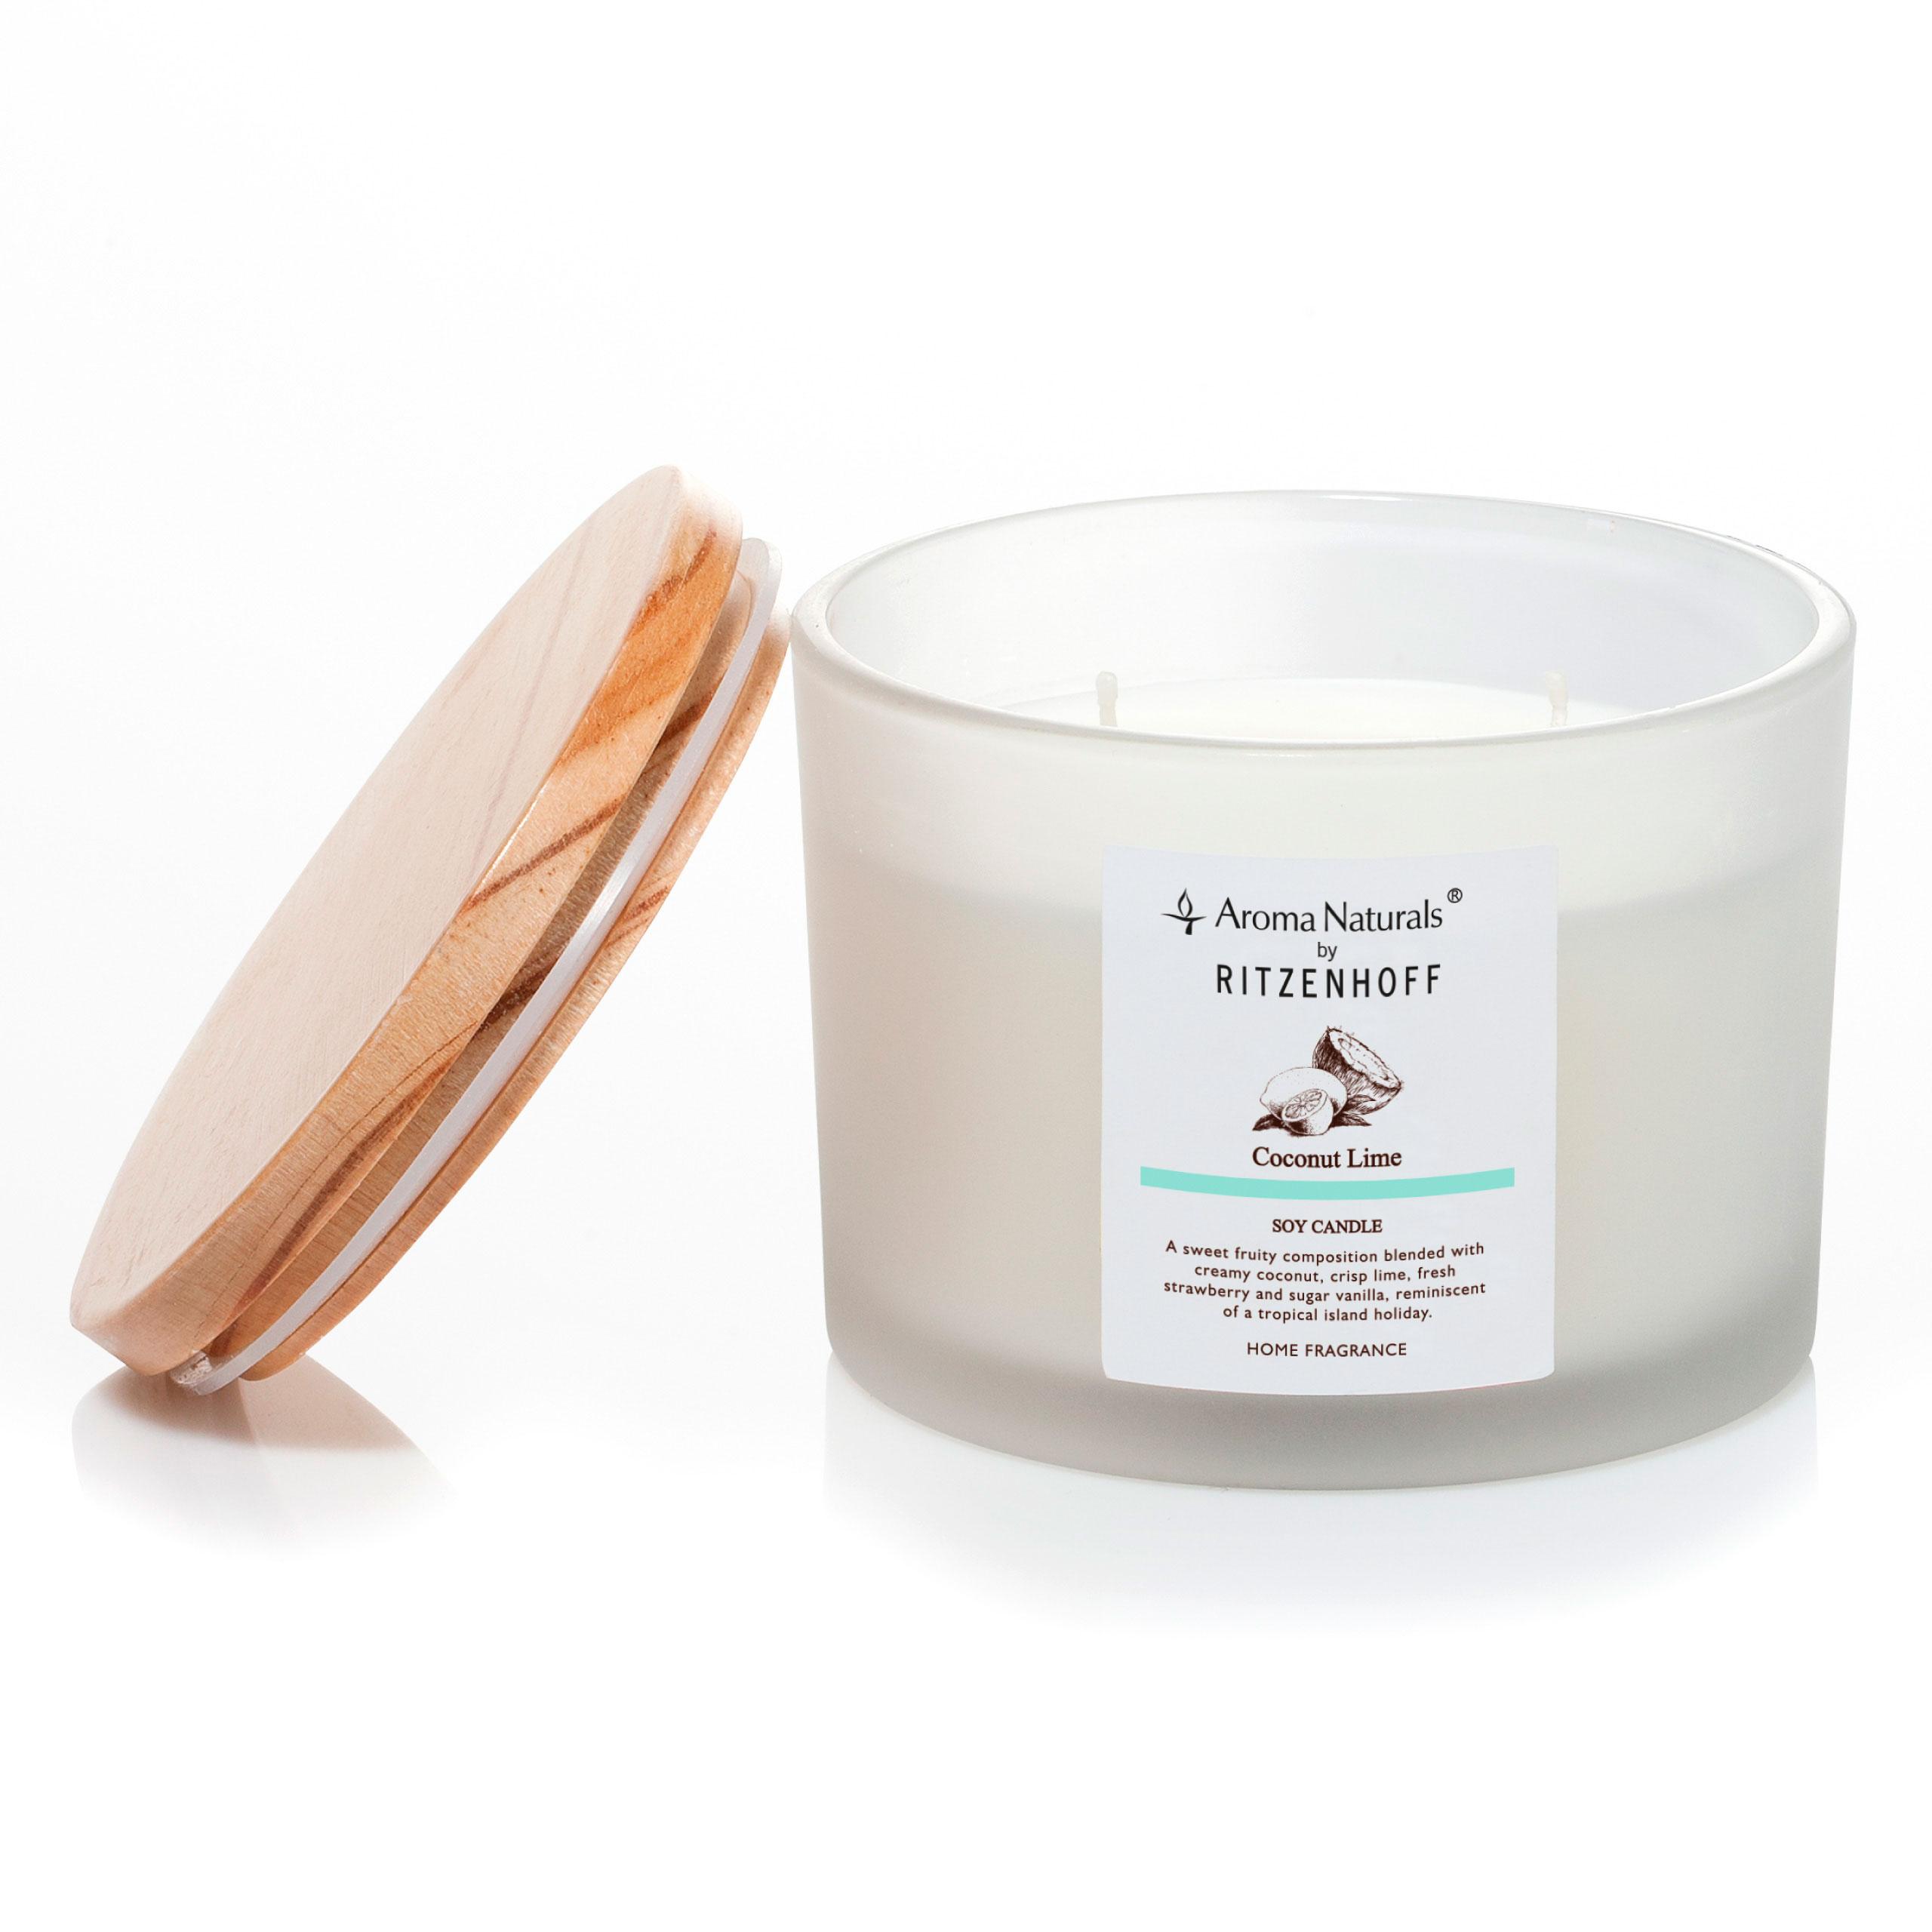 nature duftkerze 3 docht coconut lime von aroma naturals rh ritzenhoff de